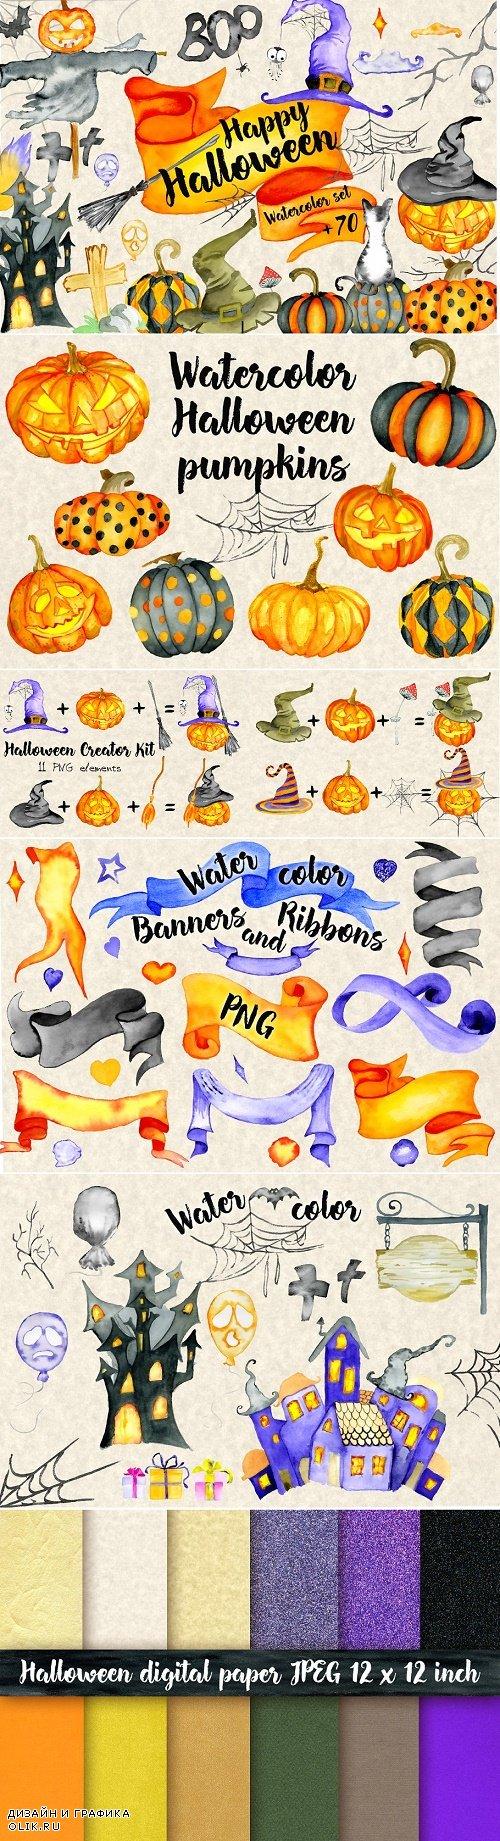 Happy Halloween Watercolor Bundle - 937853